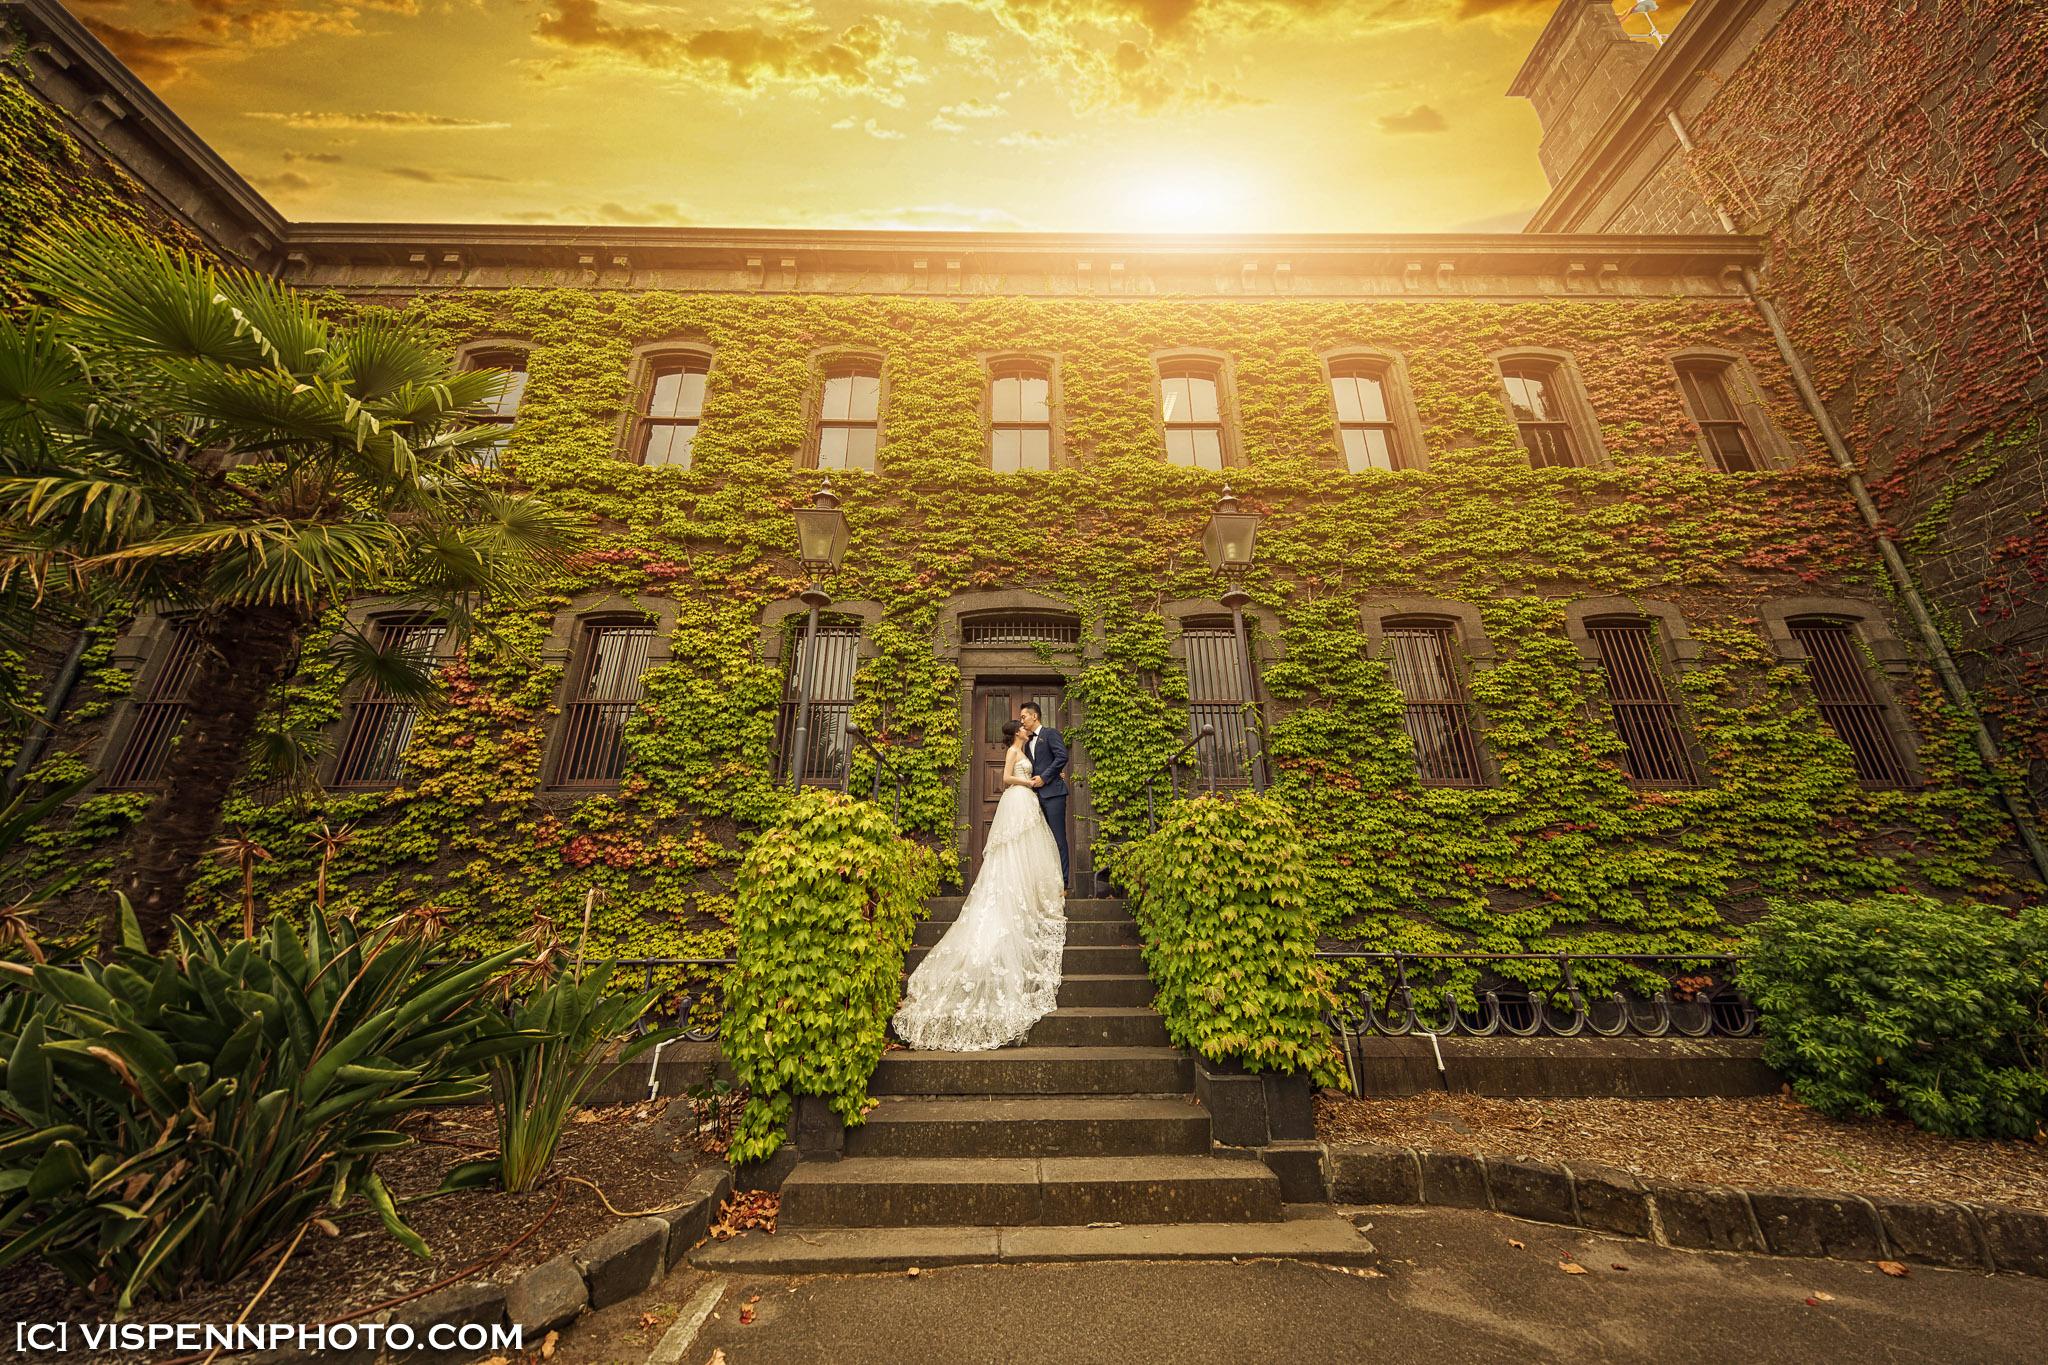 PRE WEDDING Photography Melbourne VISPENN 墨尔本 婚纱照 结婚照 婚纱摄影 VISPENN ZhouWenPreWedding 8727 1